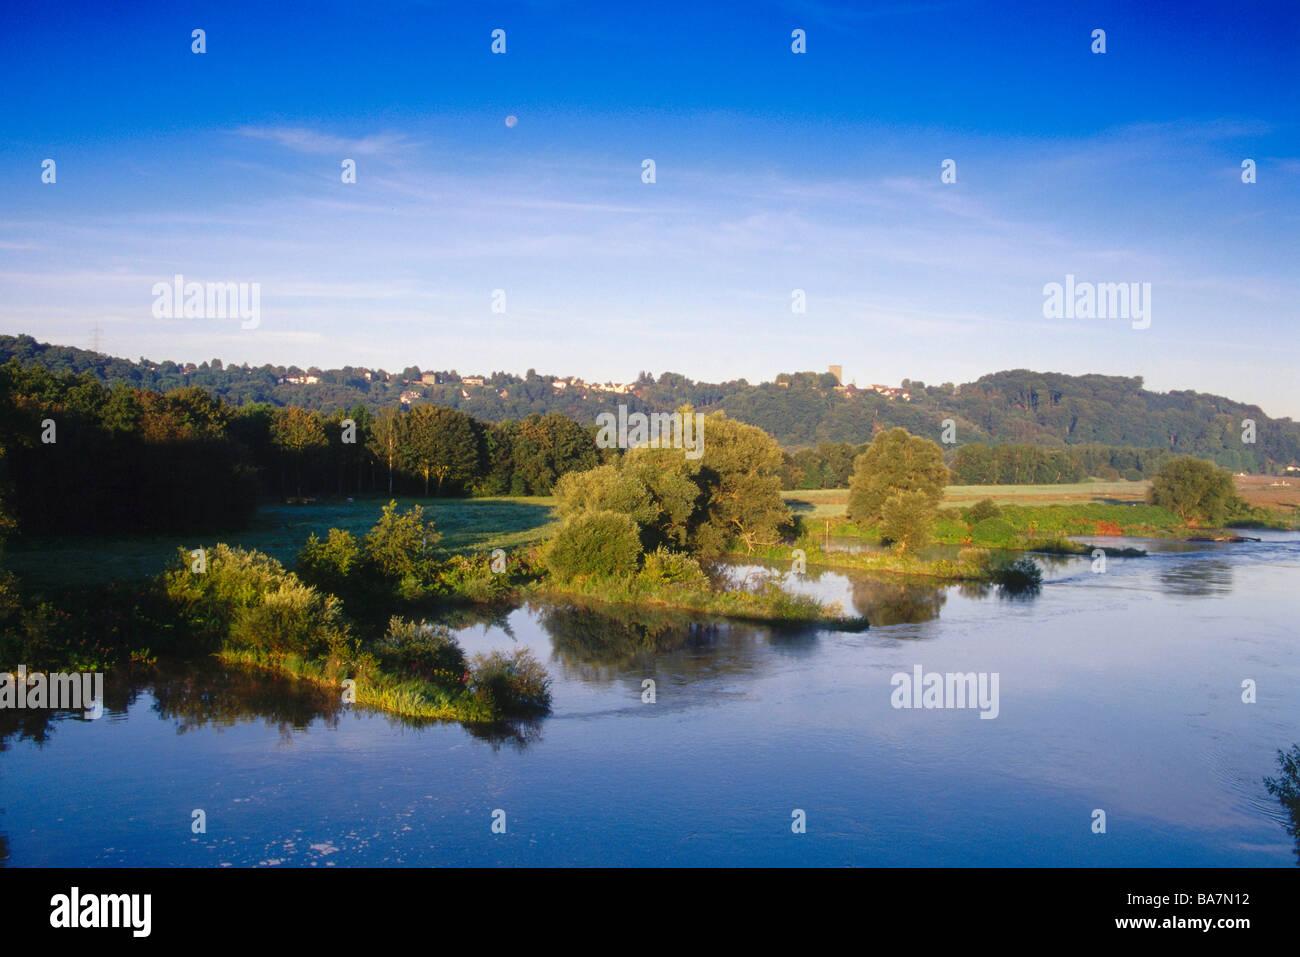 View of Hattingen, Ruhr Valley, Ruhr, Northrhine Westphalia, Germany - Stock Image